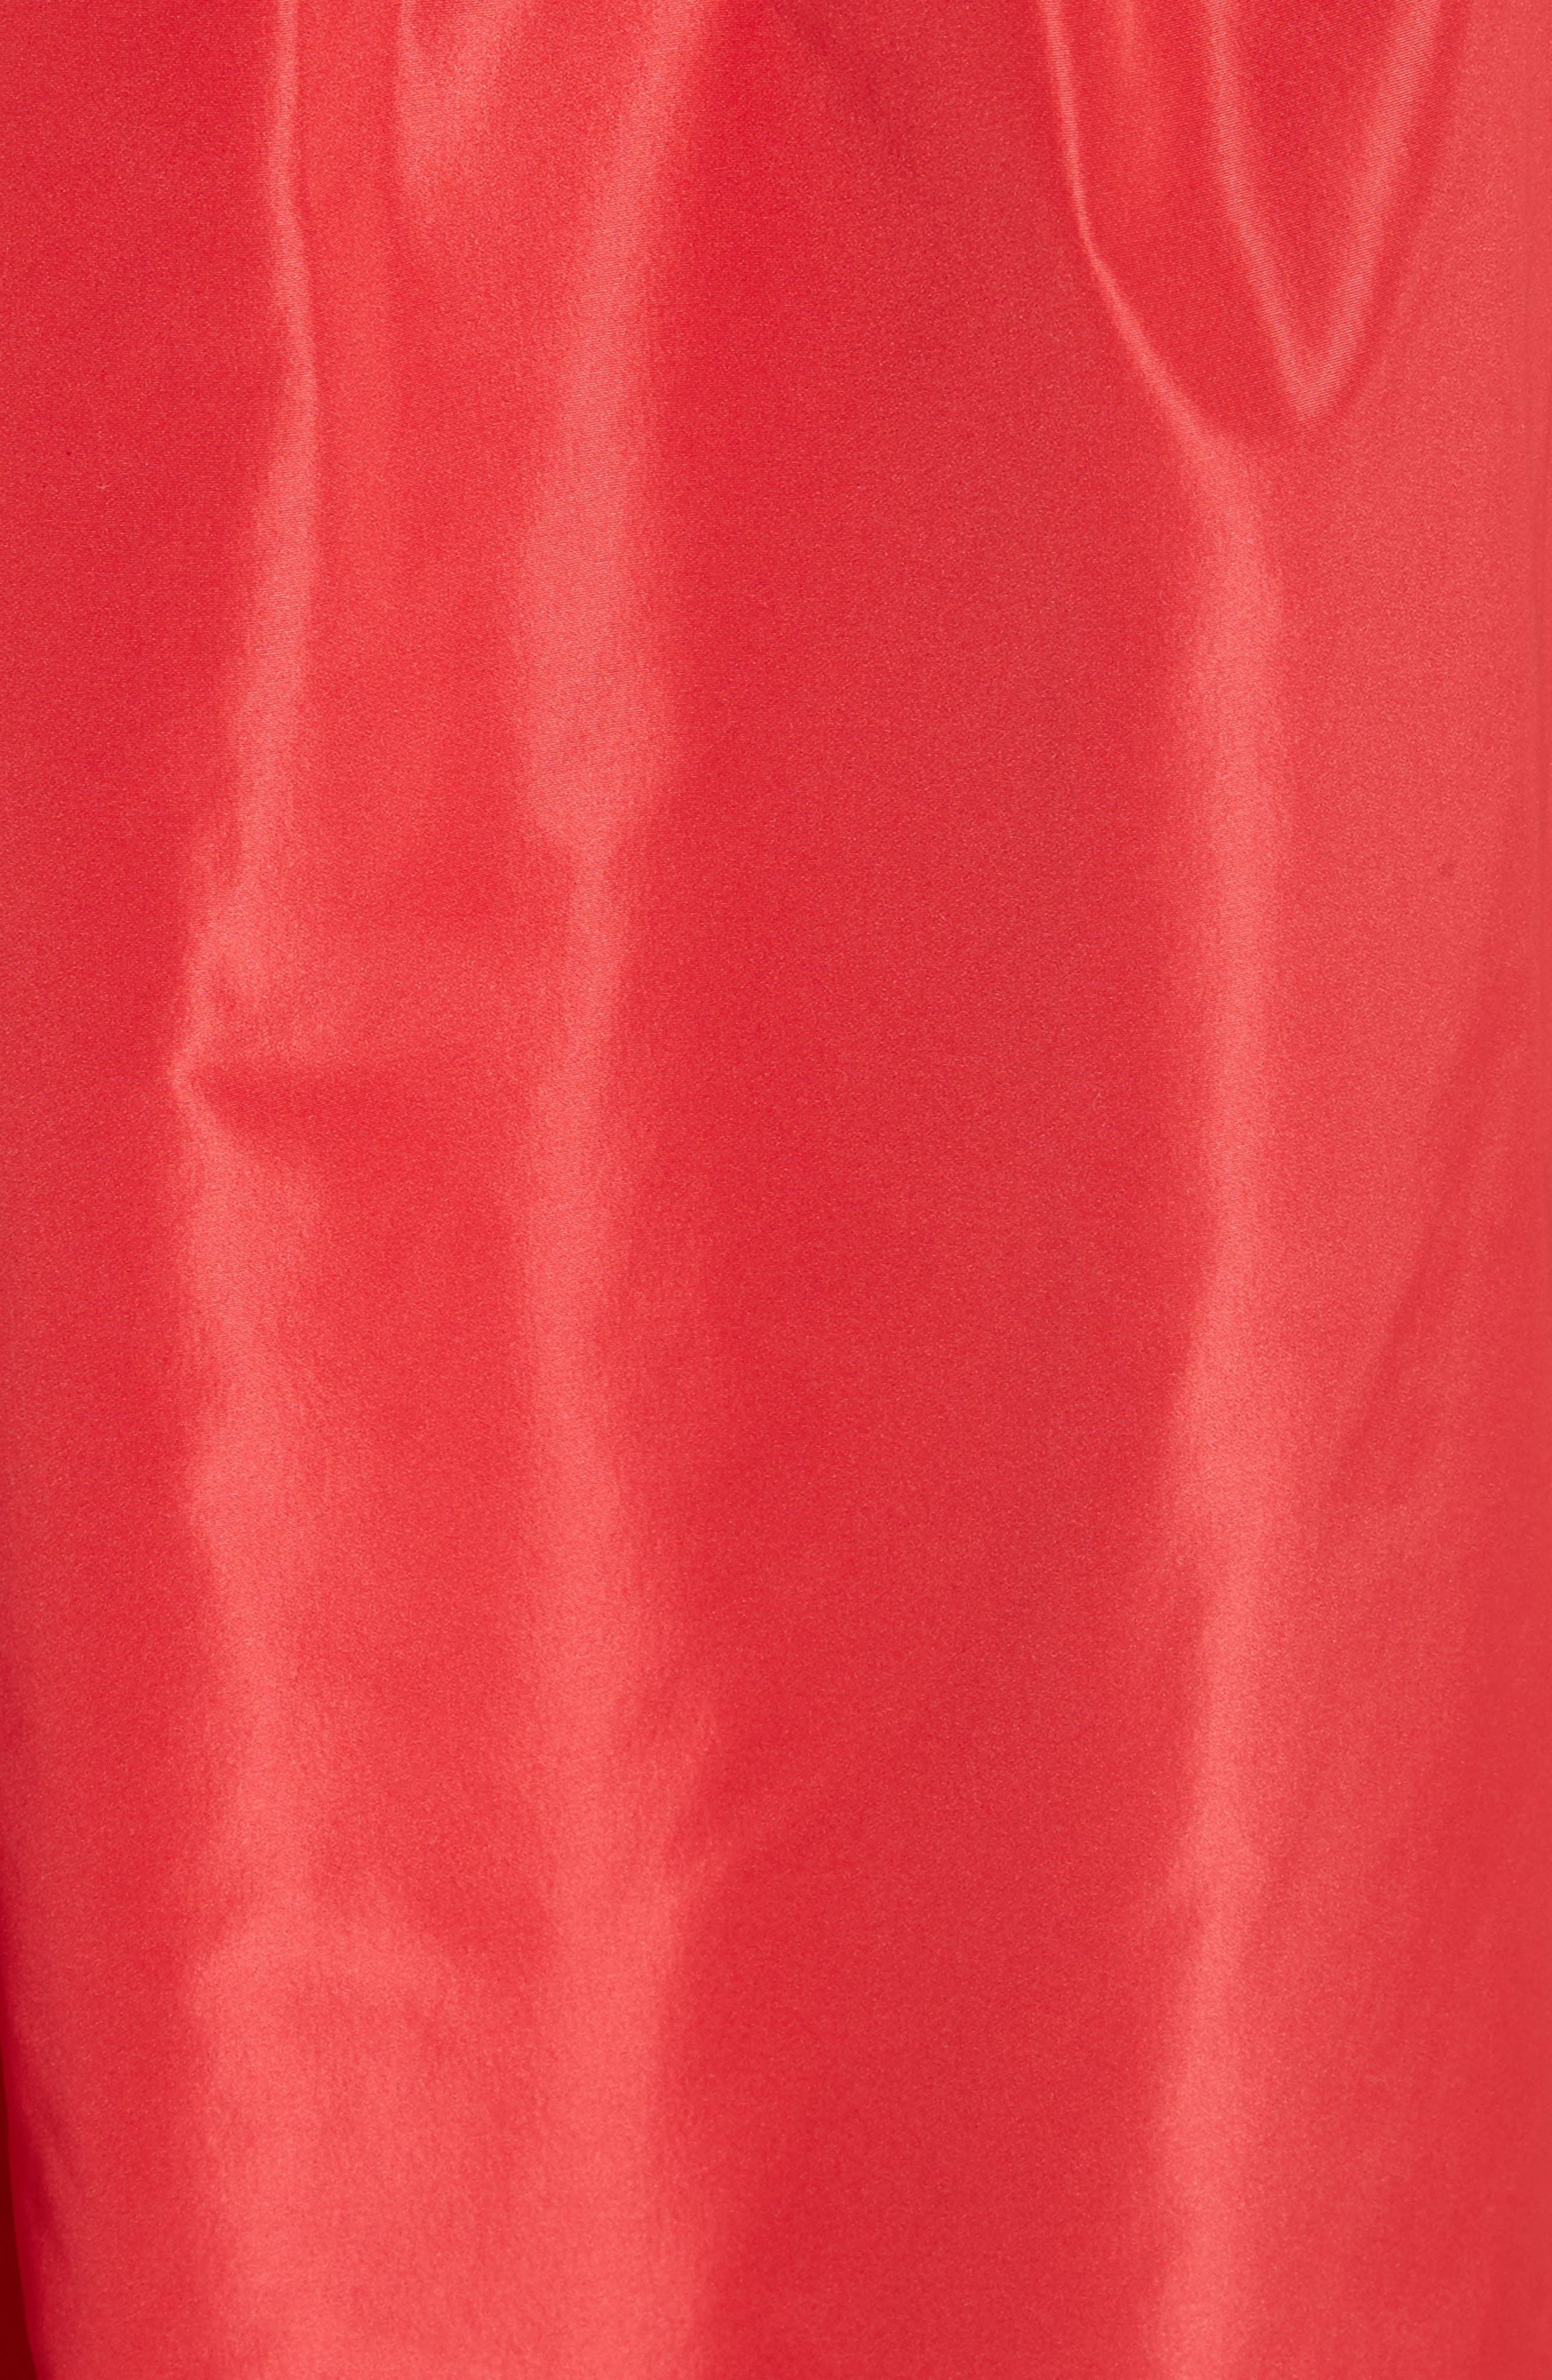 One-Shoulder Ruffle Taffeta Dress,                             Alternate thumbnail 5, color,                             641